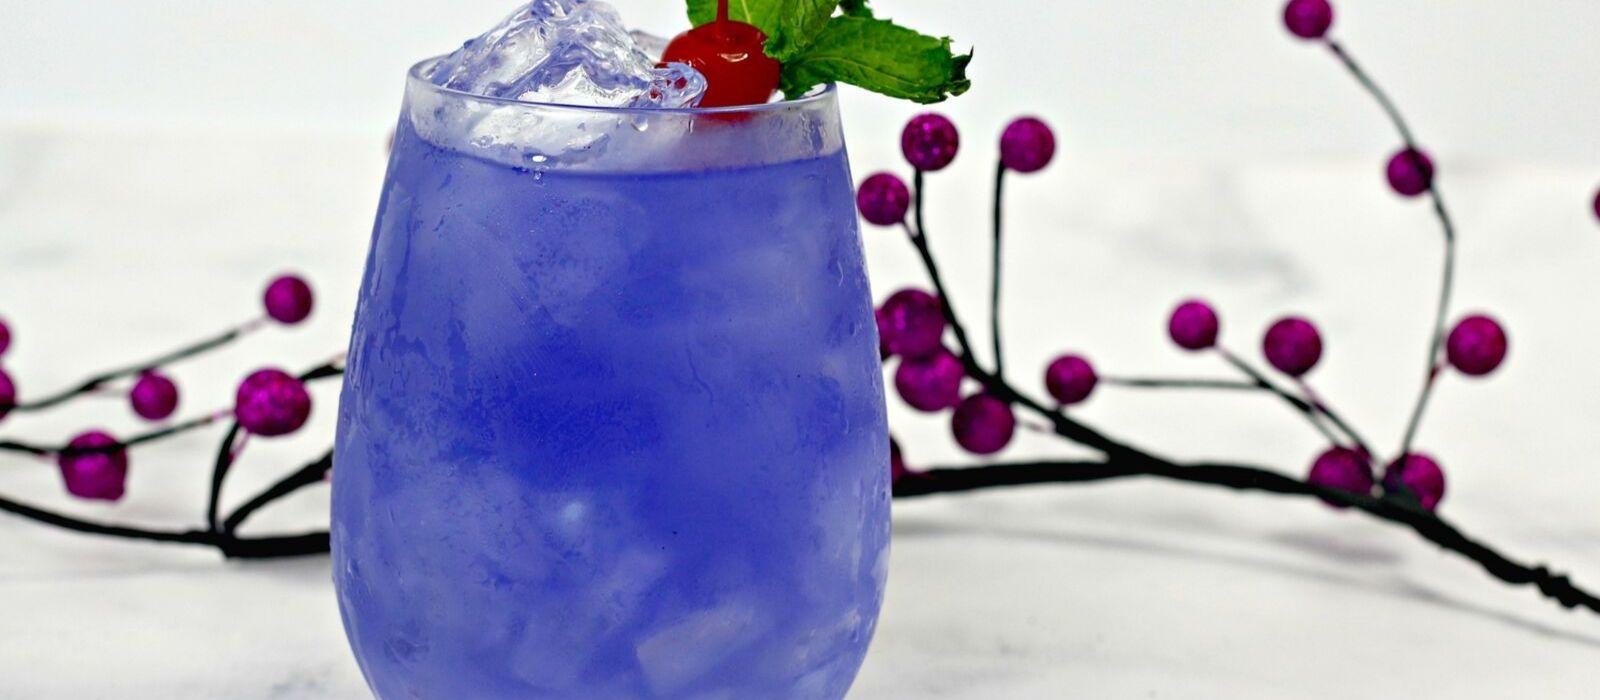 Maleficent Cocktail| Villain Cocktail Recipe| Maleficent Cocktail Recipe| Maleficent Vodka Cocktail| Disney Themed Cocktail| #disney #maleficent #cocktail #halloween #villain